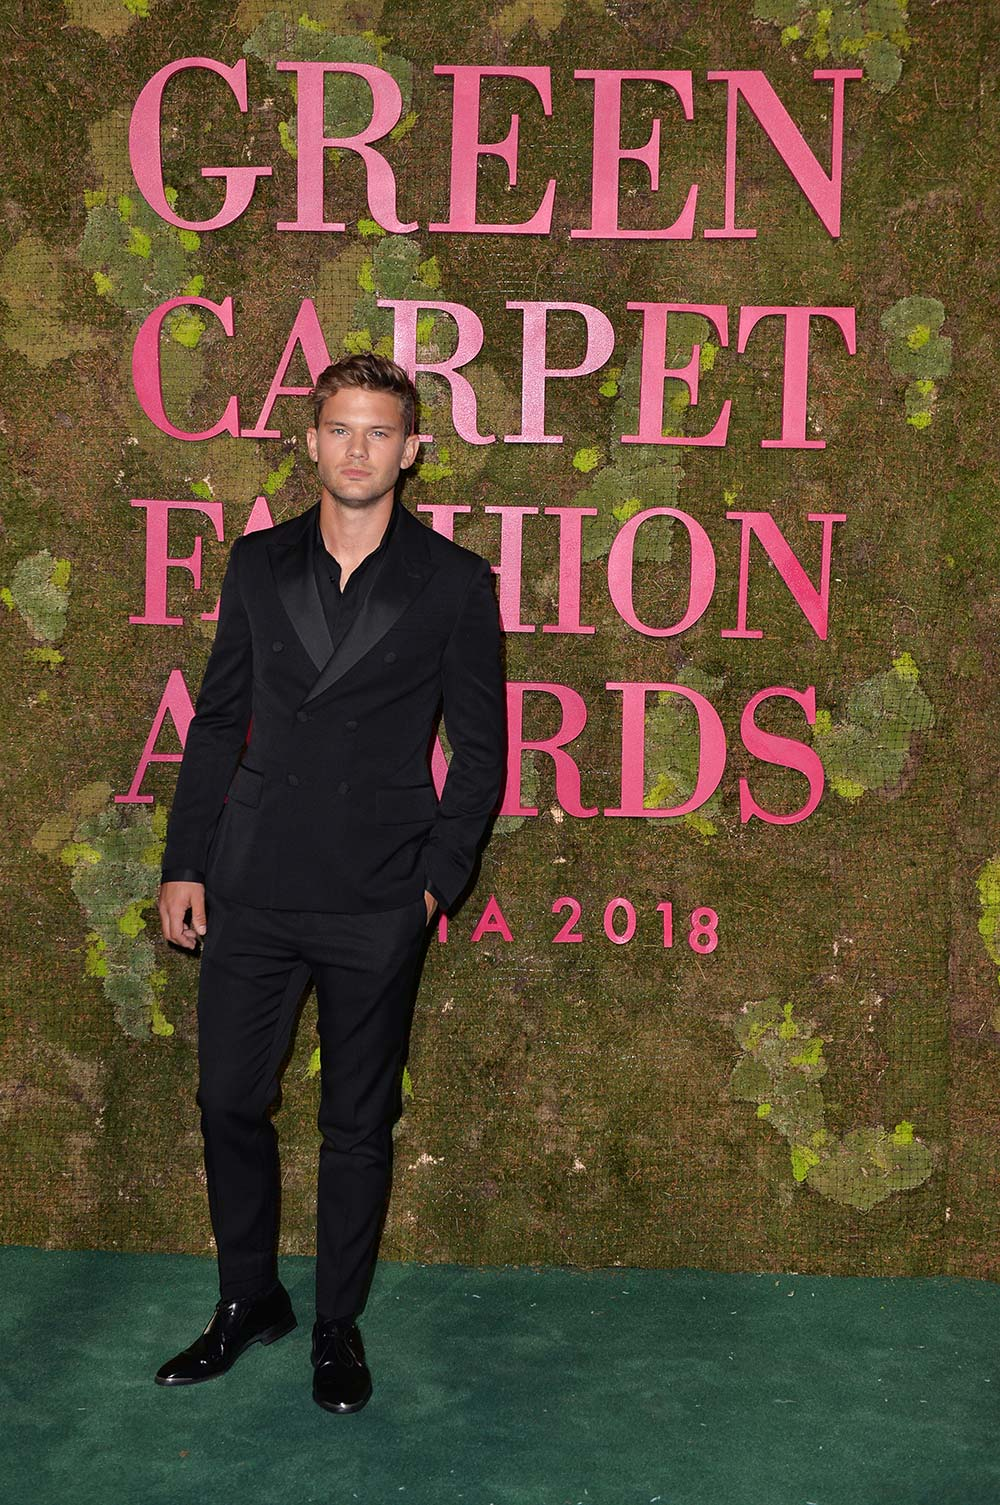 Green Carpet Fashion Awards 2018 - Jeremey Irvine - Grooming Massimo Serini Team